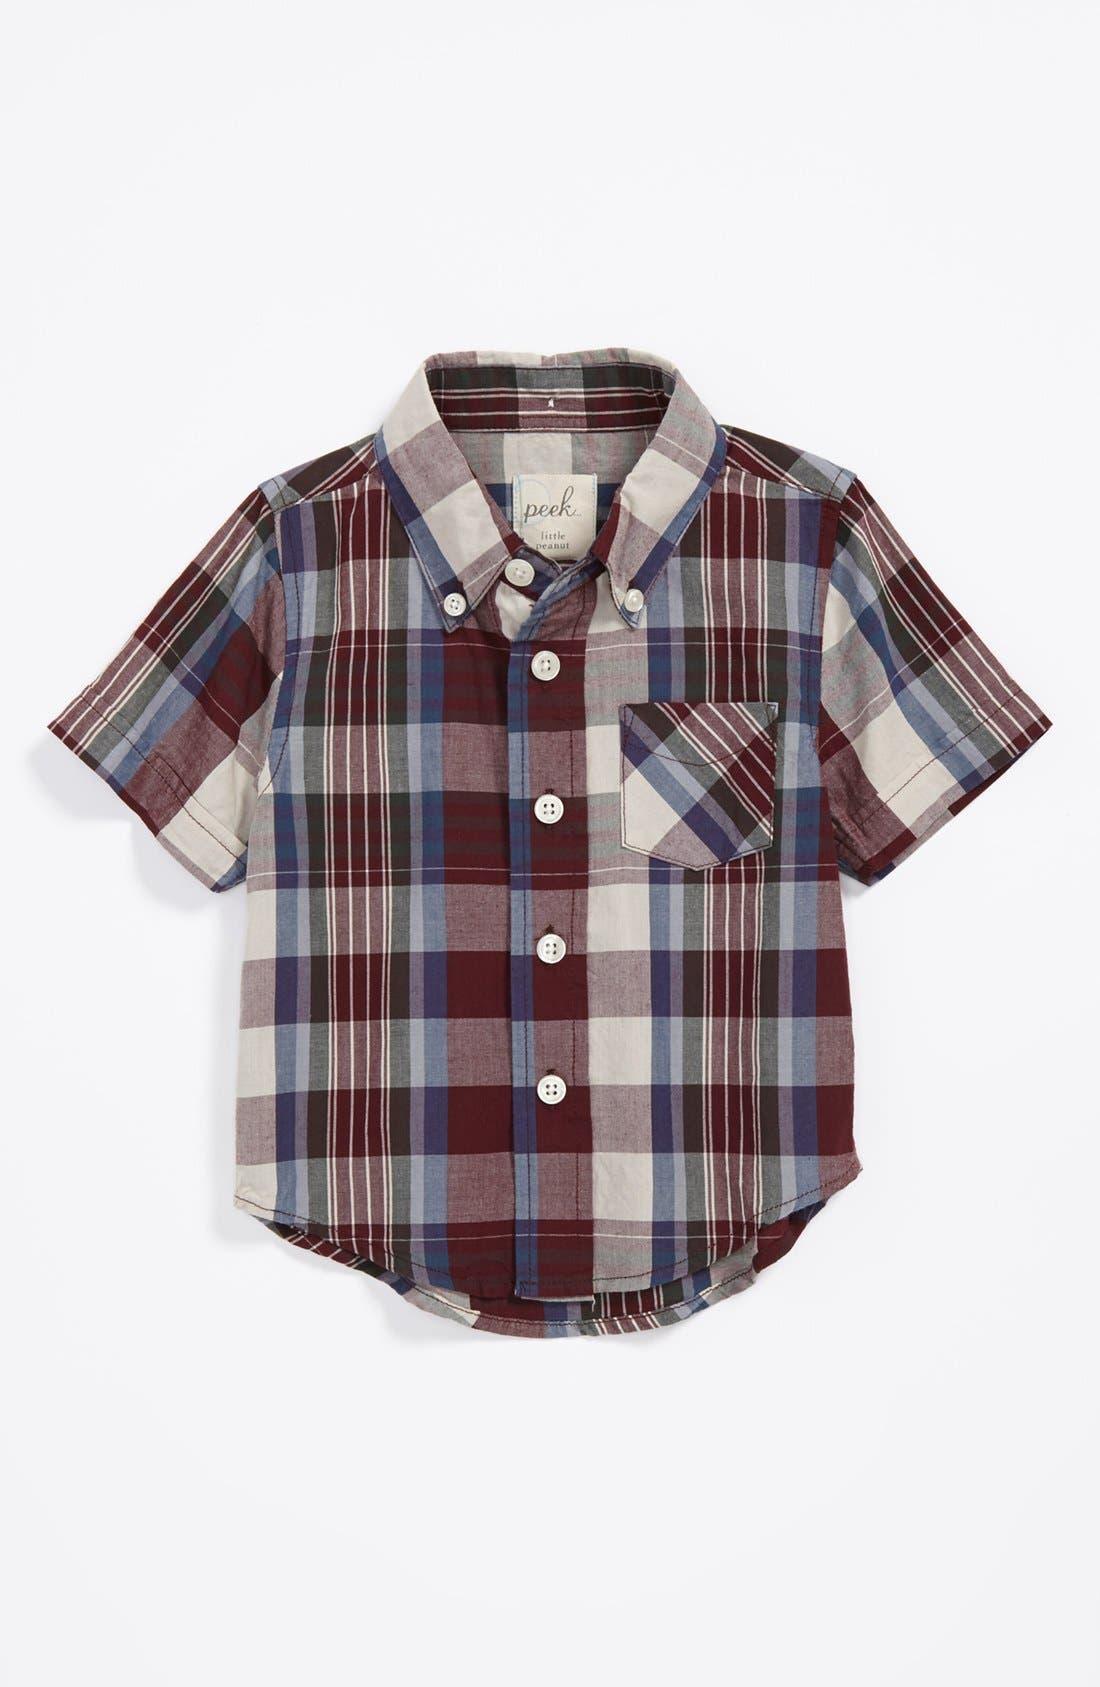 Main Image - Peek 'Oliver' Plaid Shirt (Baby Boys)